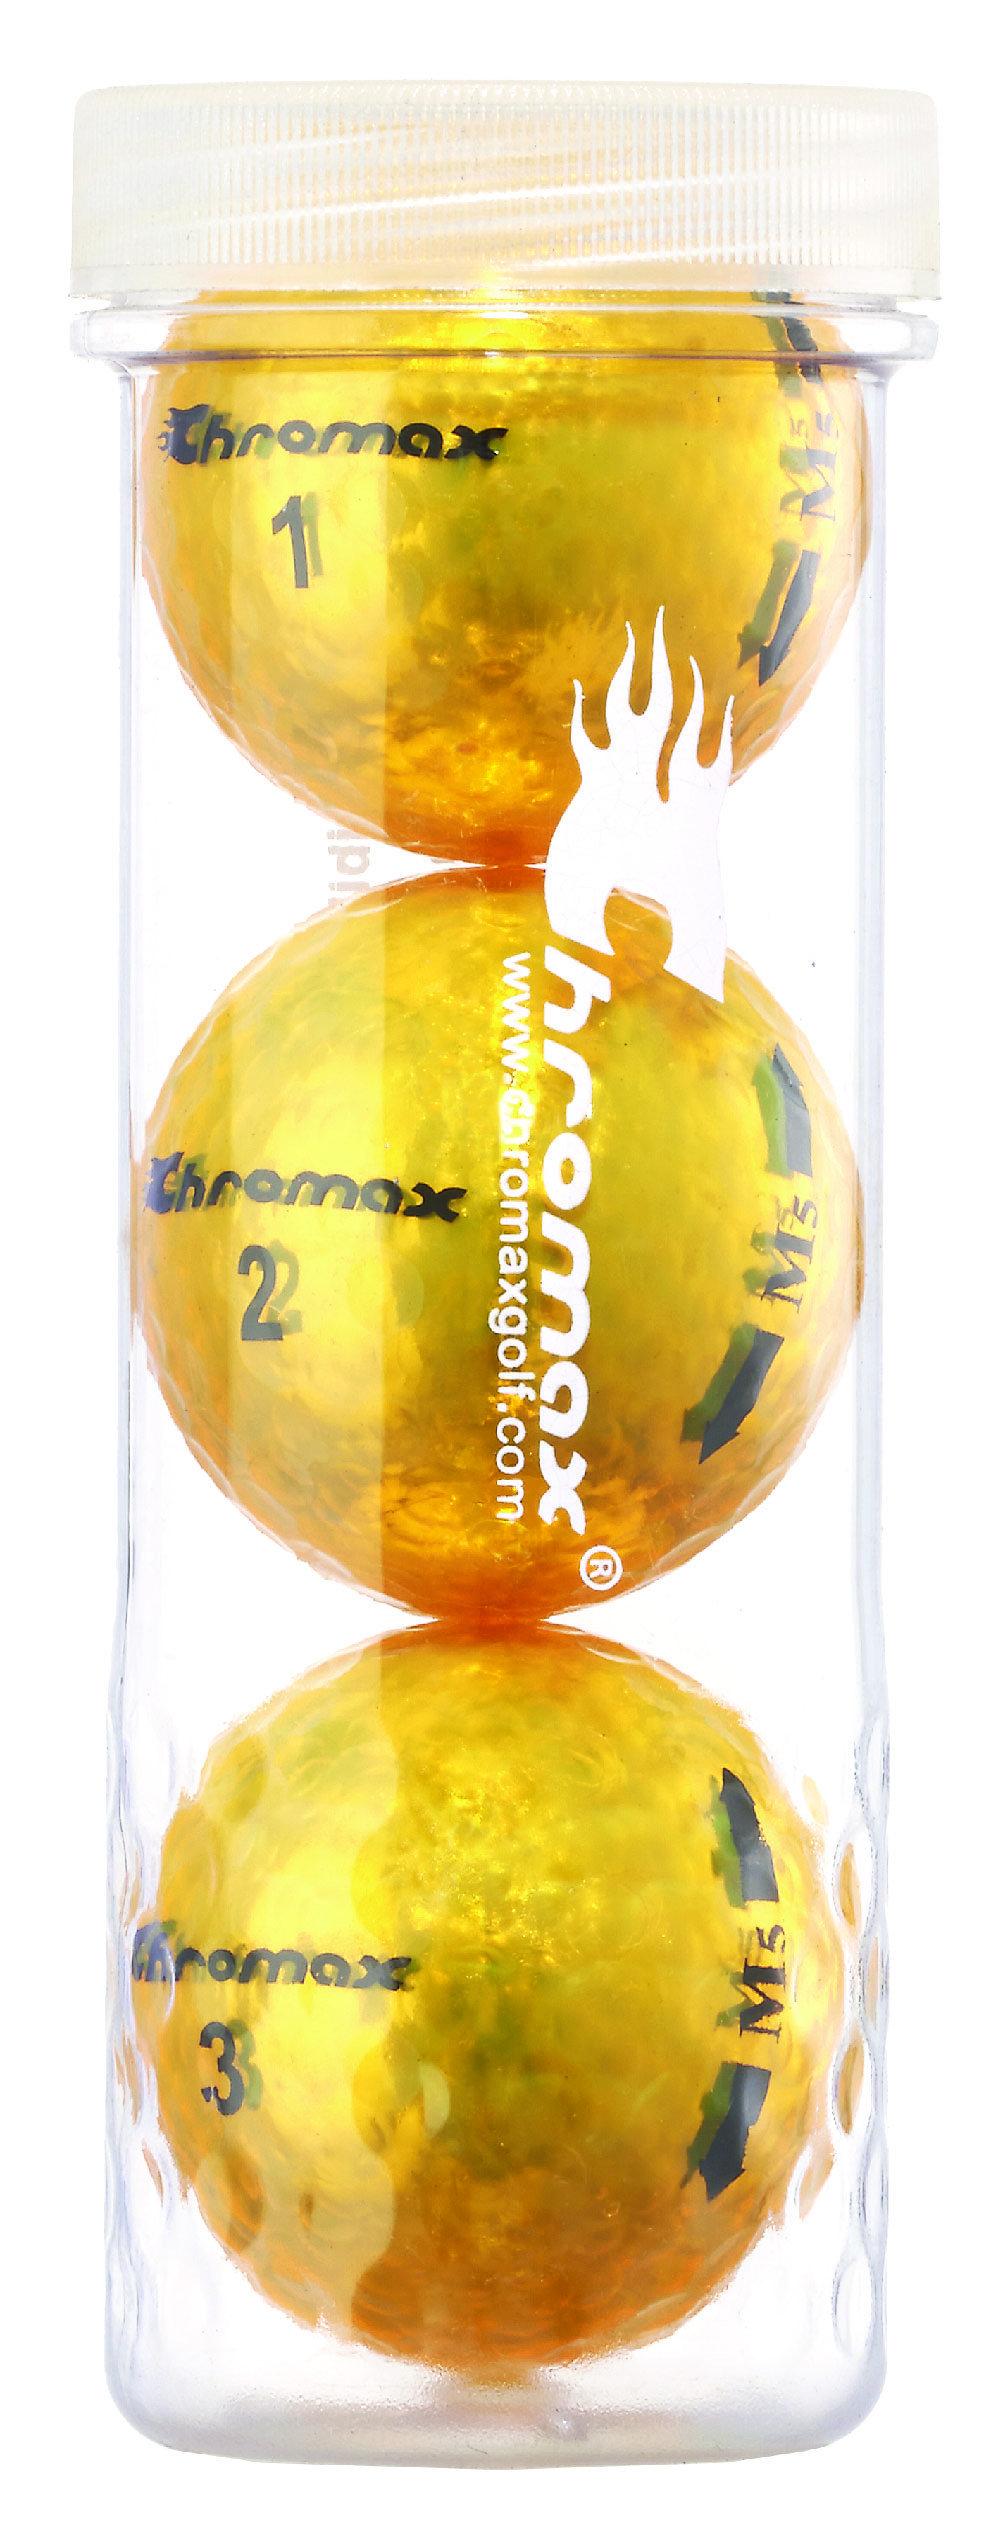 Chromax® Colored Gold Golf Balls - Metallic M5 3 Ball Tube CM53GLD